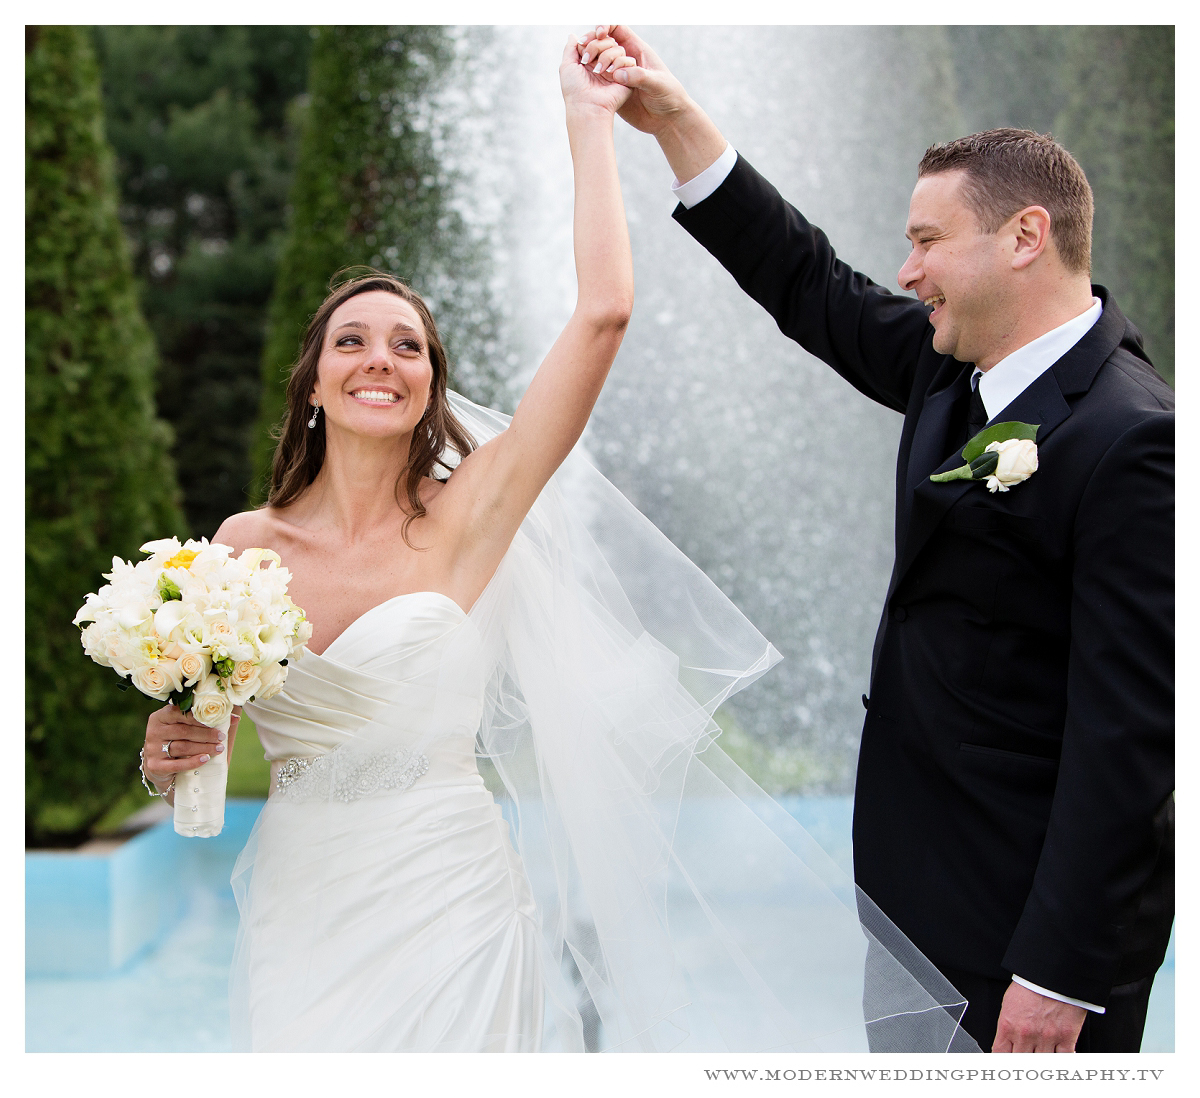 Carltun on the Park Wedding  Eisenhower Park  East Meadow New York 026 Modern Wedding Photography.jpg